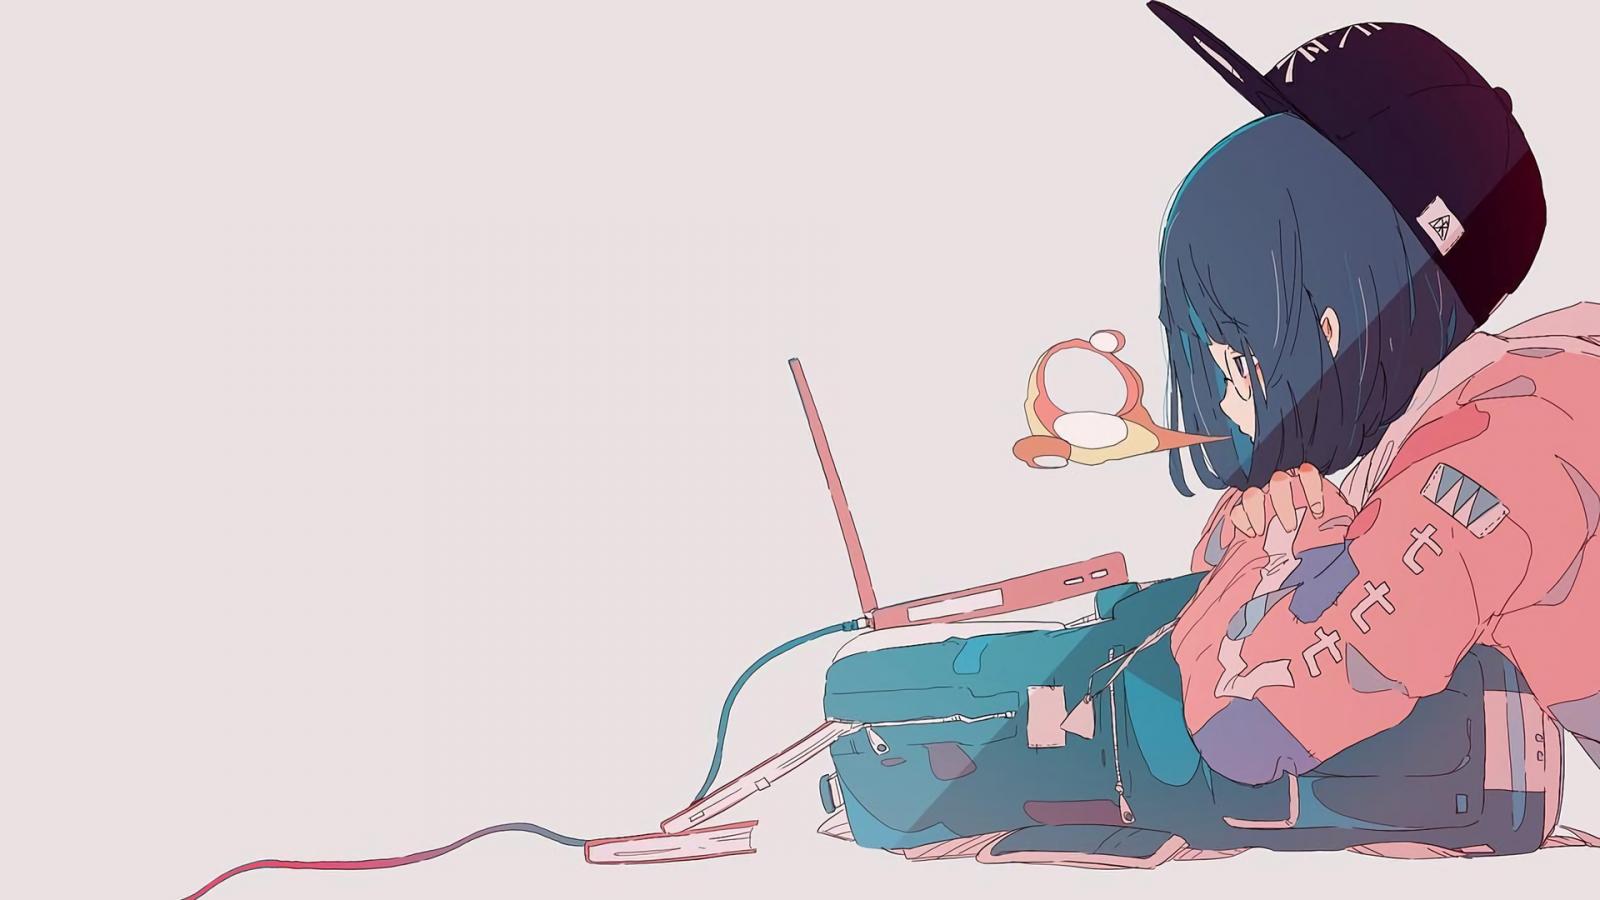 Wallpaper Manga Gadis Anime Latar Belakang Yang